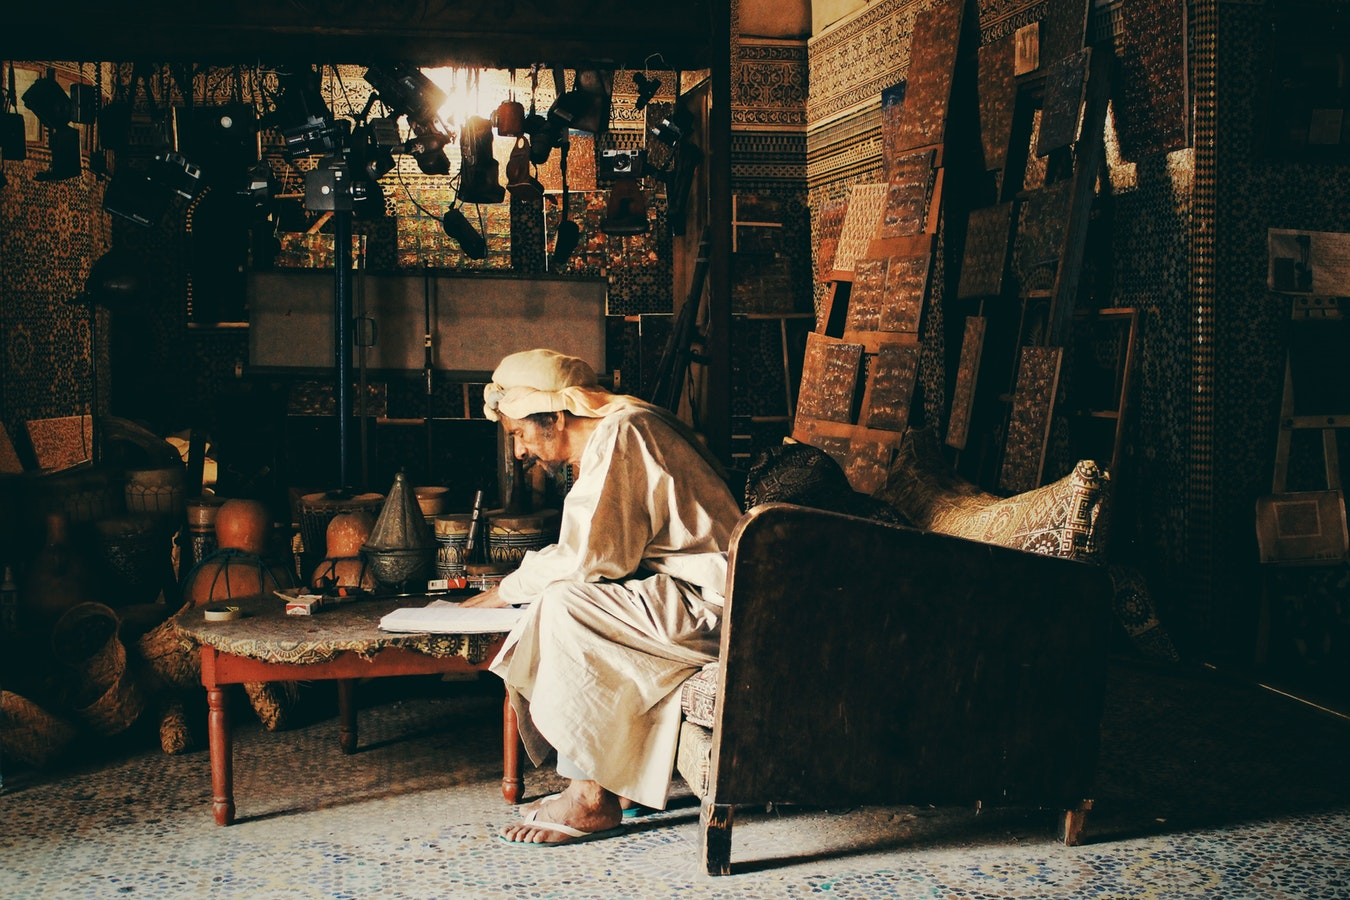 араб, ученый